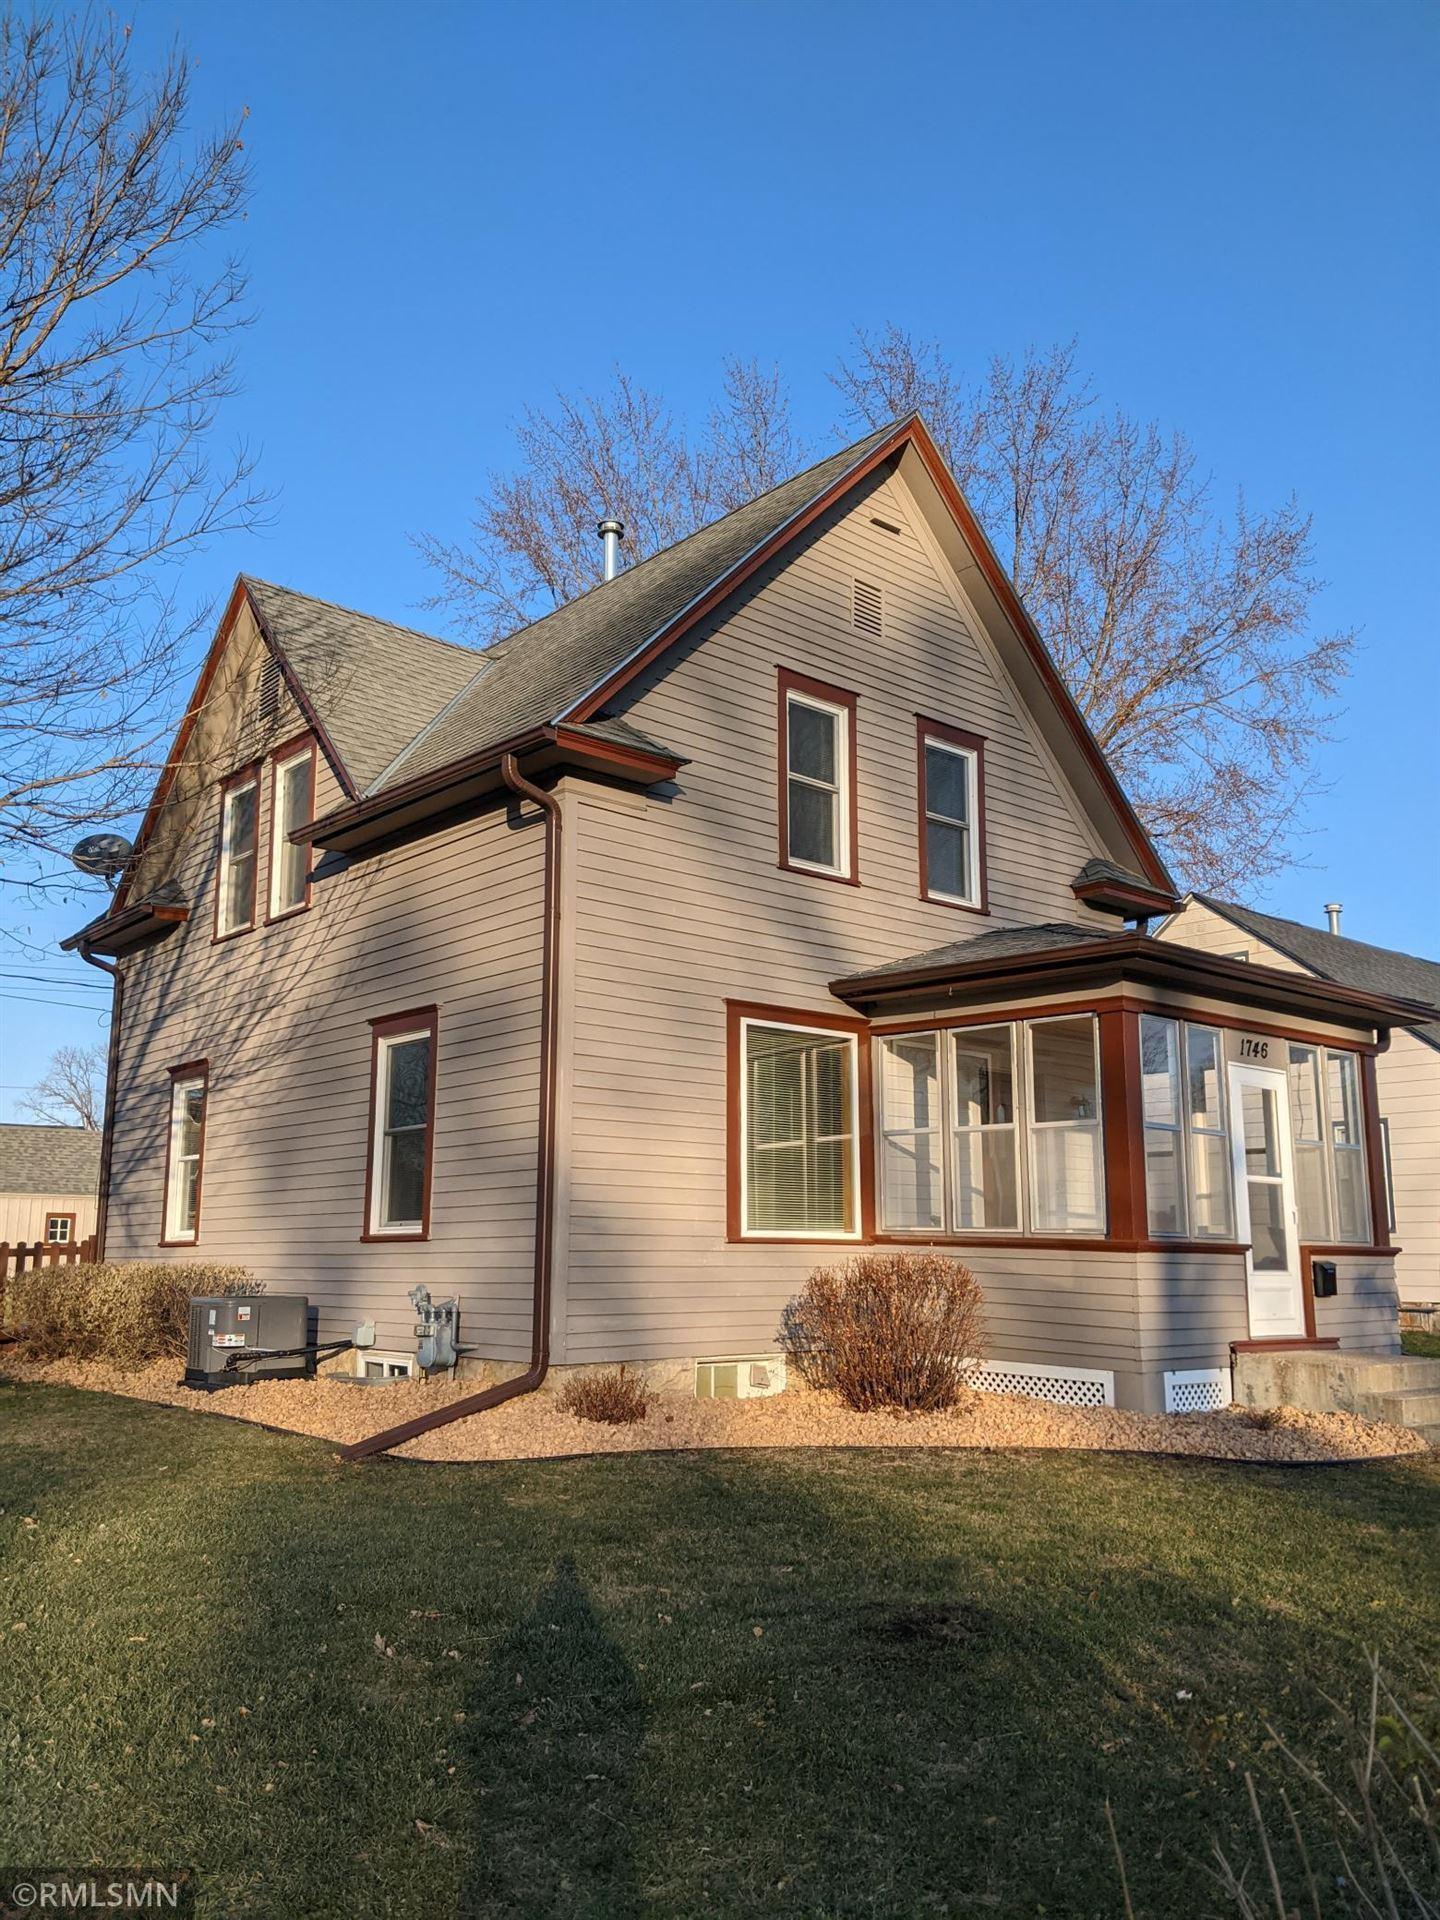 1746 W 7th Street, Red Wing, MN 55066 - MLS#: 5682620